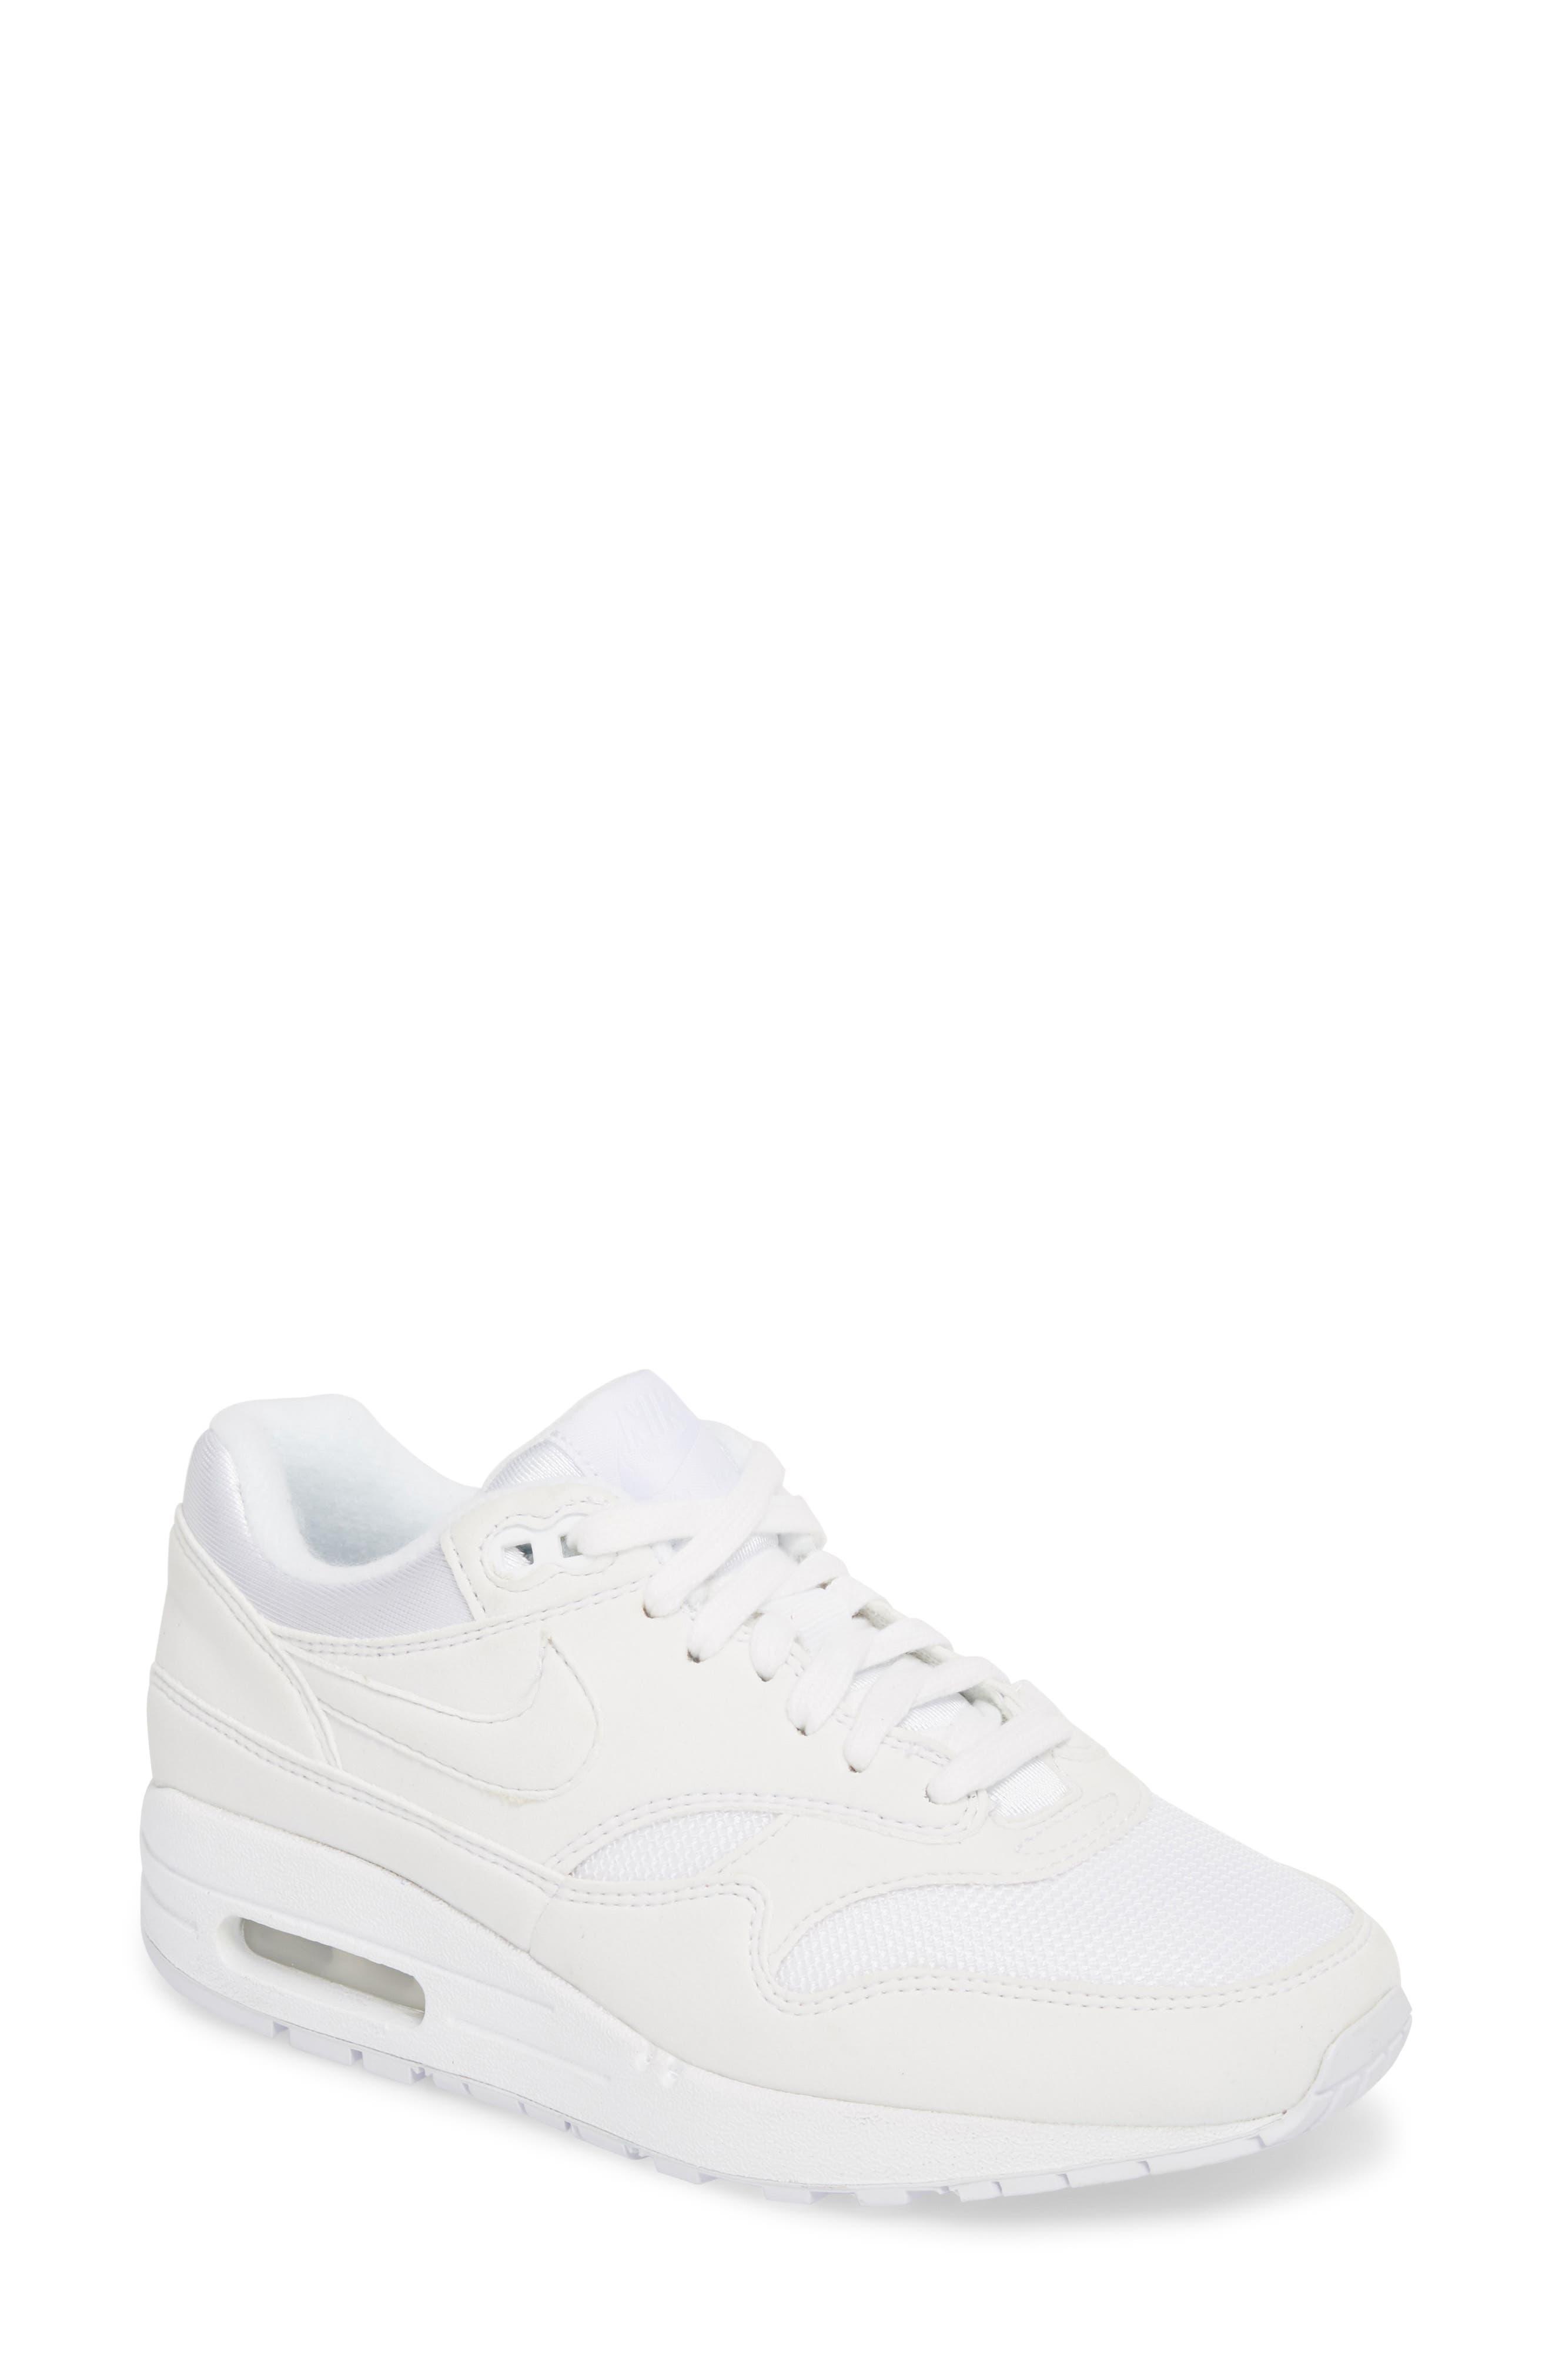 'Air Max 1 ND' Sneaker,                         Main,                         color, WHITE/ WHITE/ PURE PLATINUM